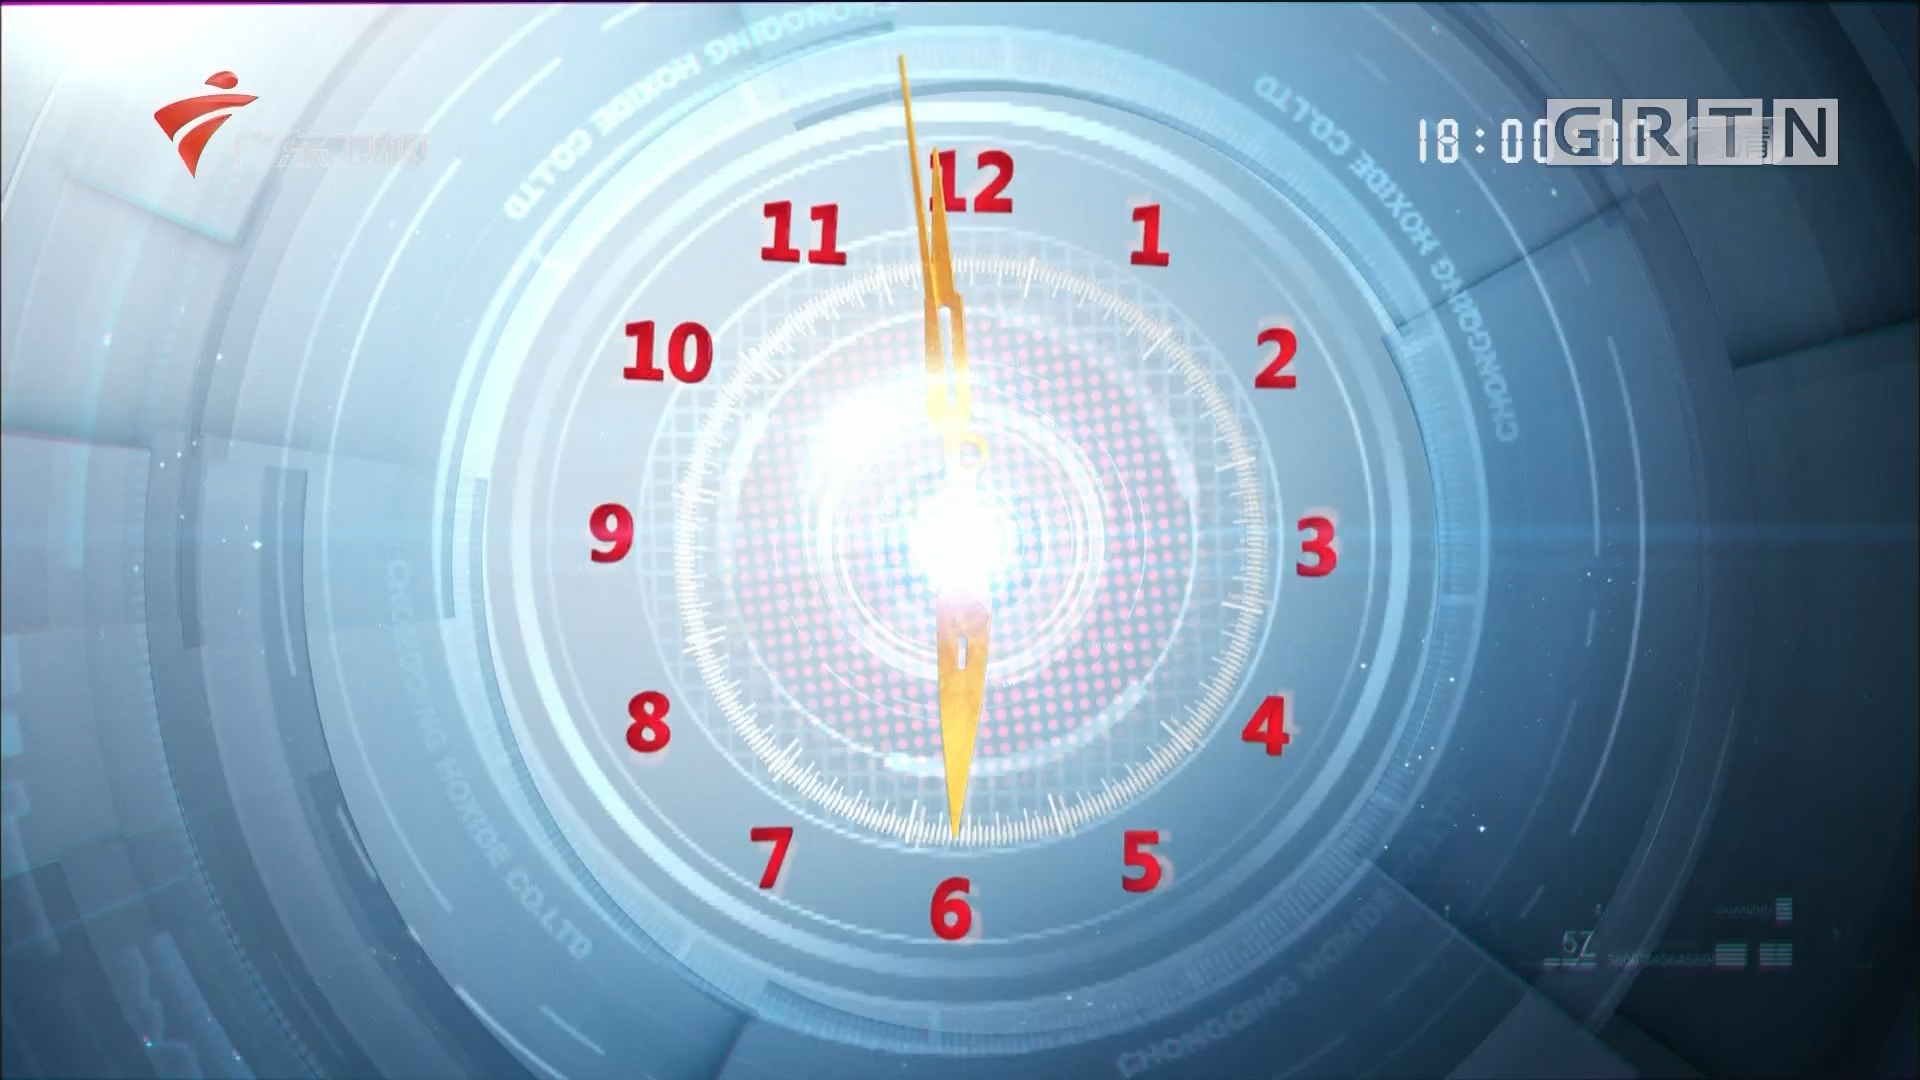 [HD][2019-05-17]直播全球:粤港合作联席会议第二十一次会议在广州召开:马兴瑞林郑月娥出席会议并作主题发言